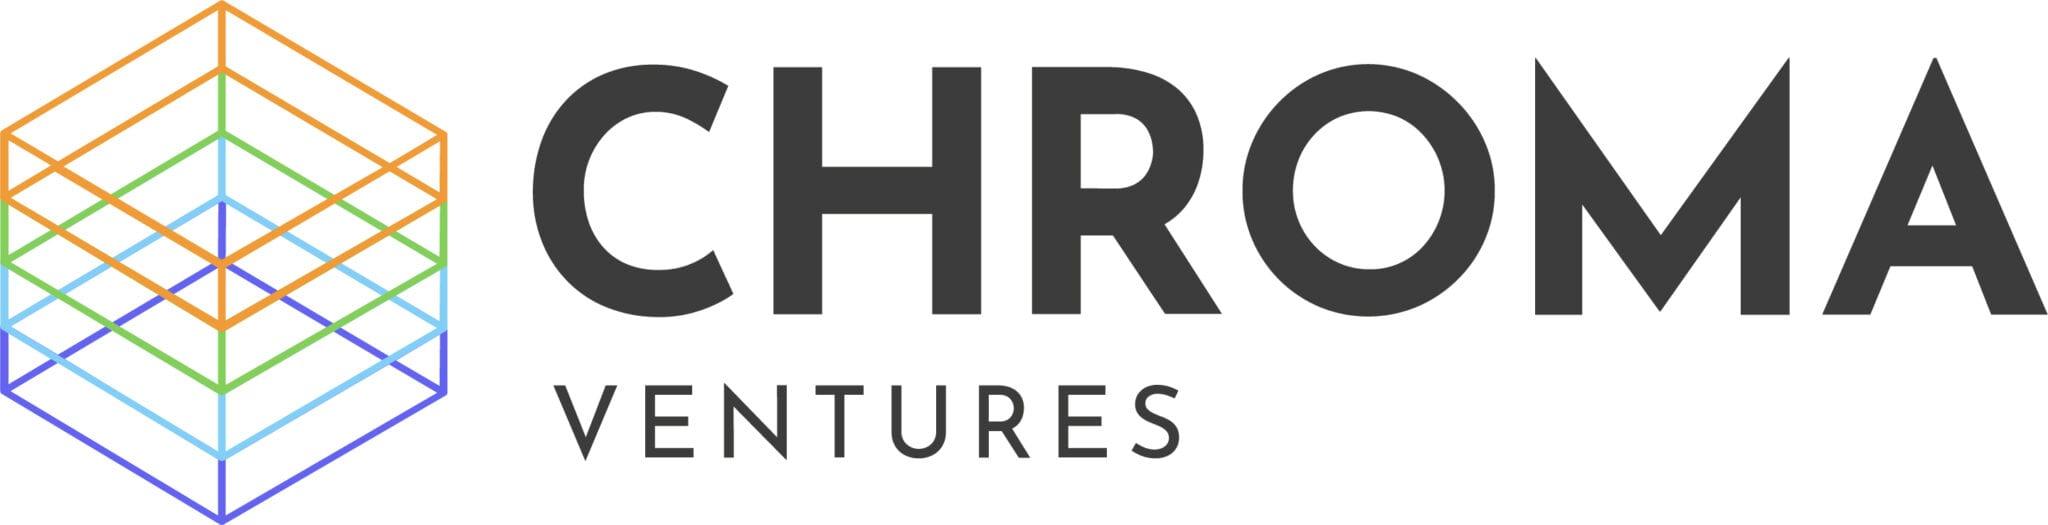 Chroma ventures logo